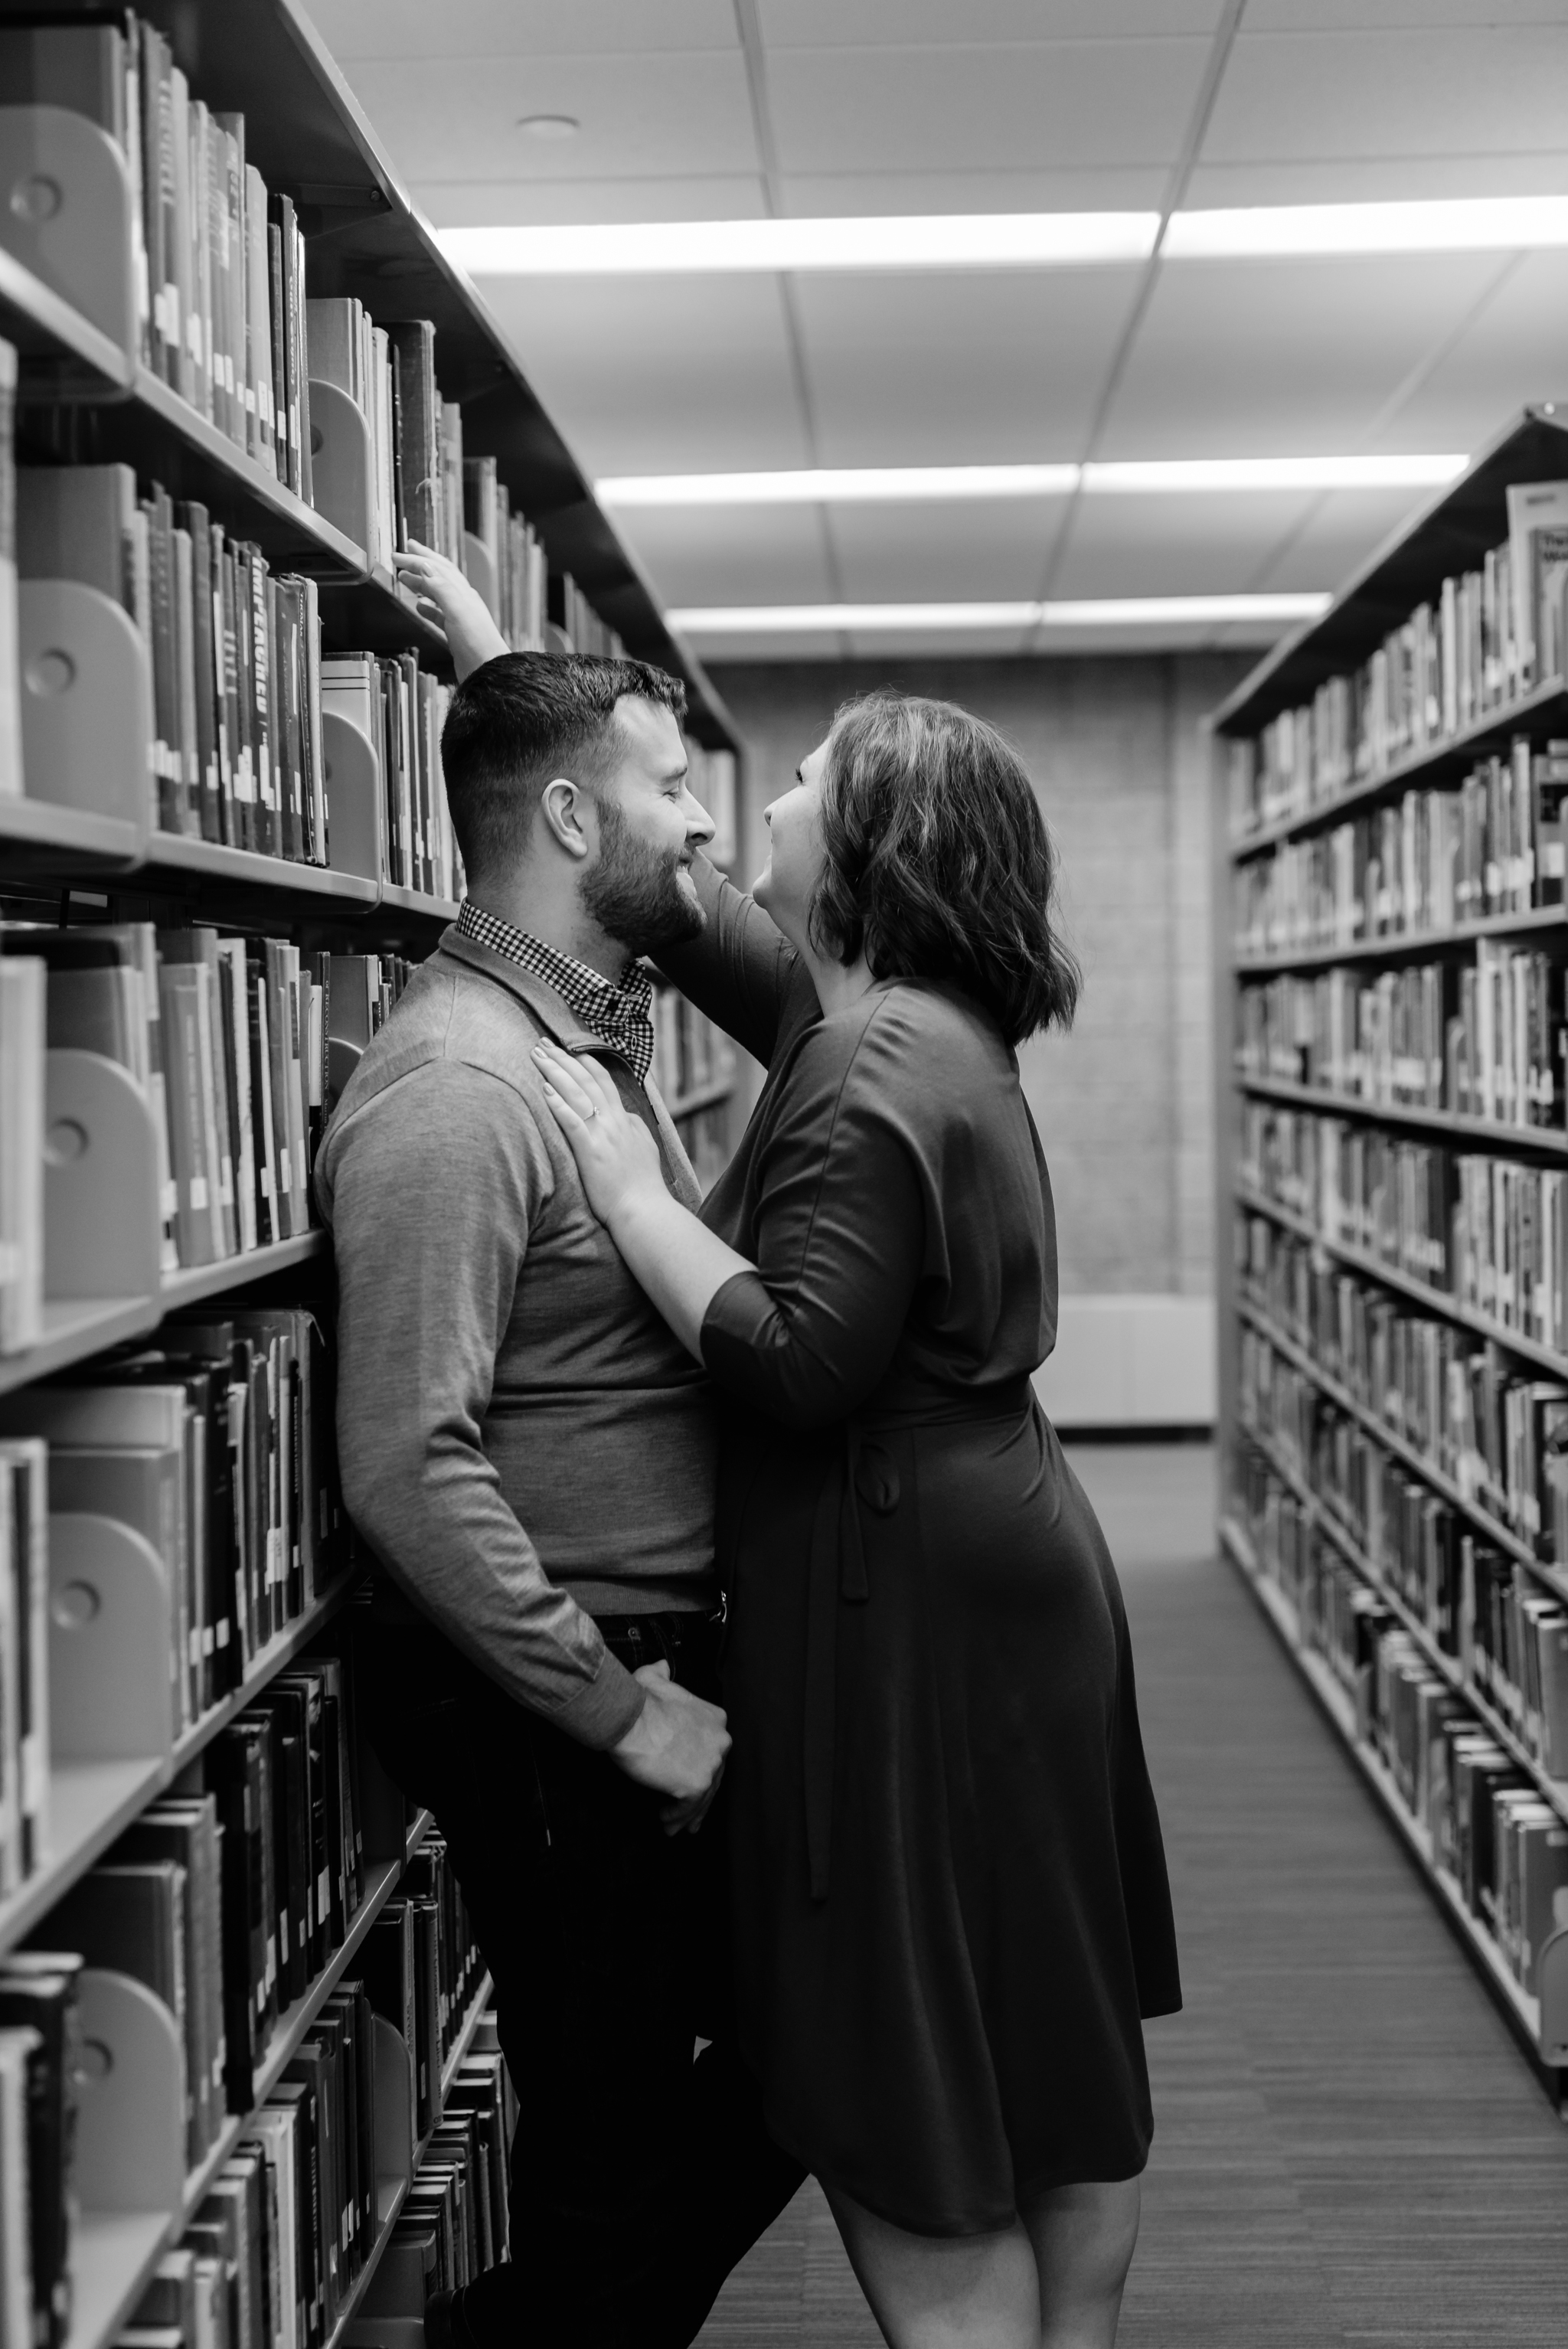 Fargo-Moorhead MSUM Library Engagement Photos | Chelsea Joy Photography